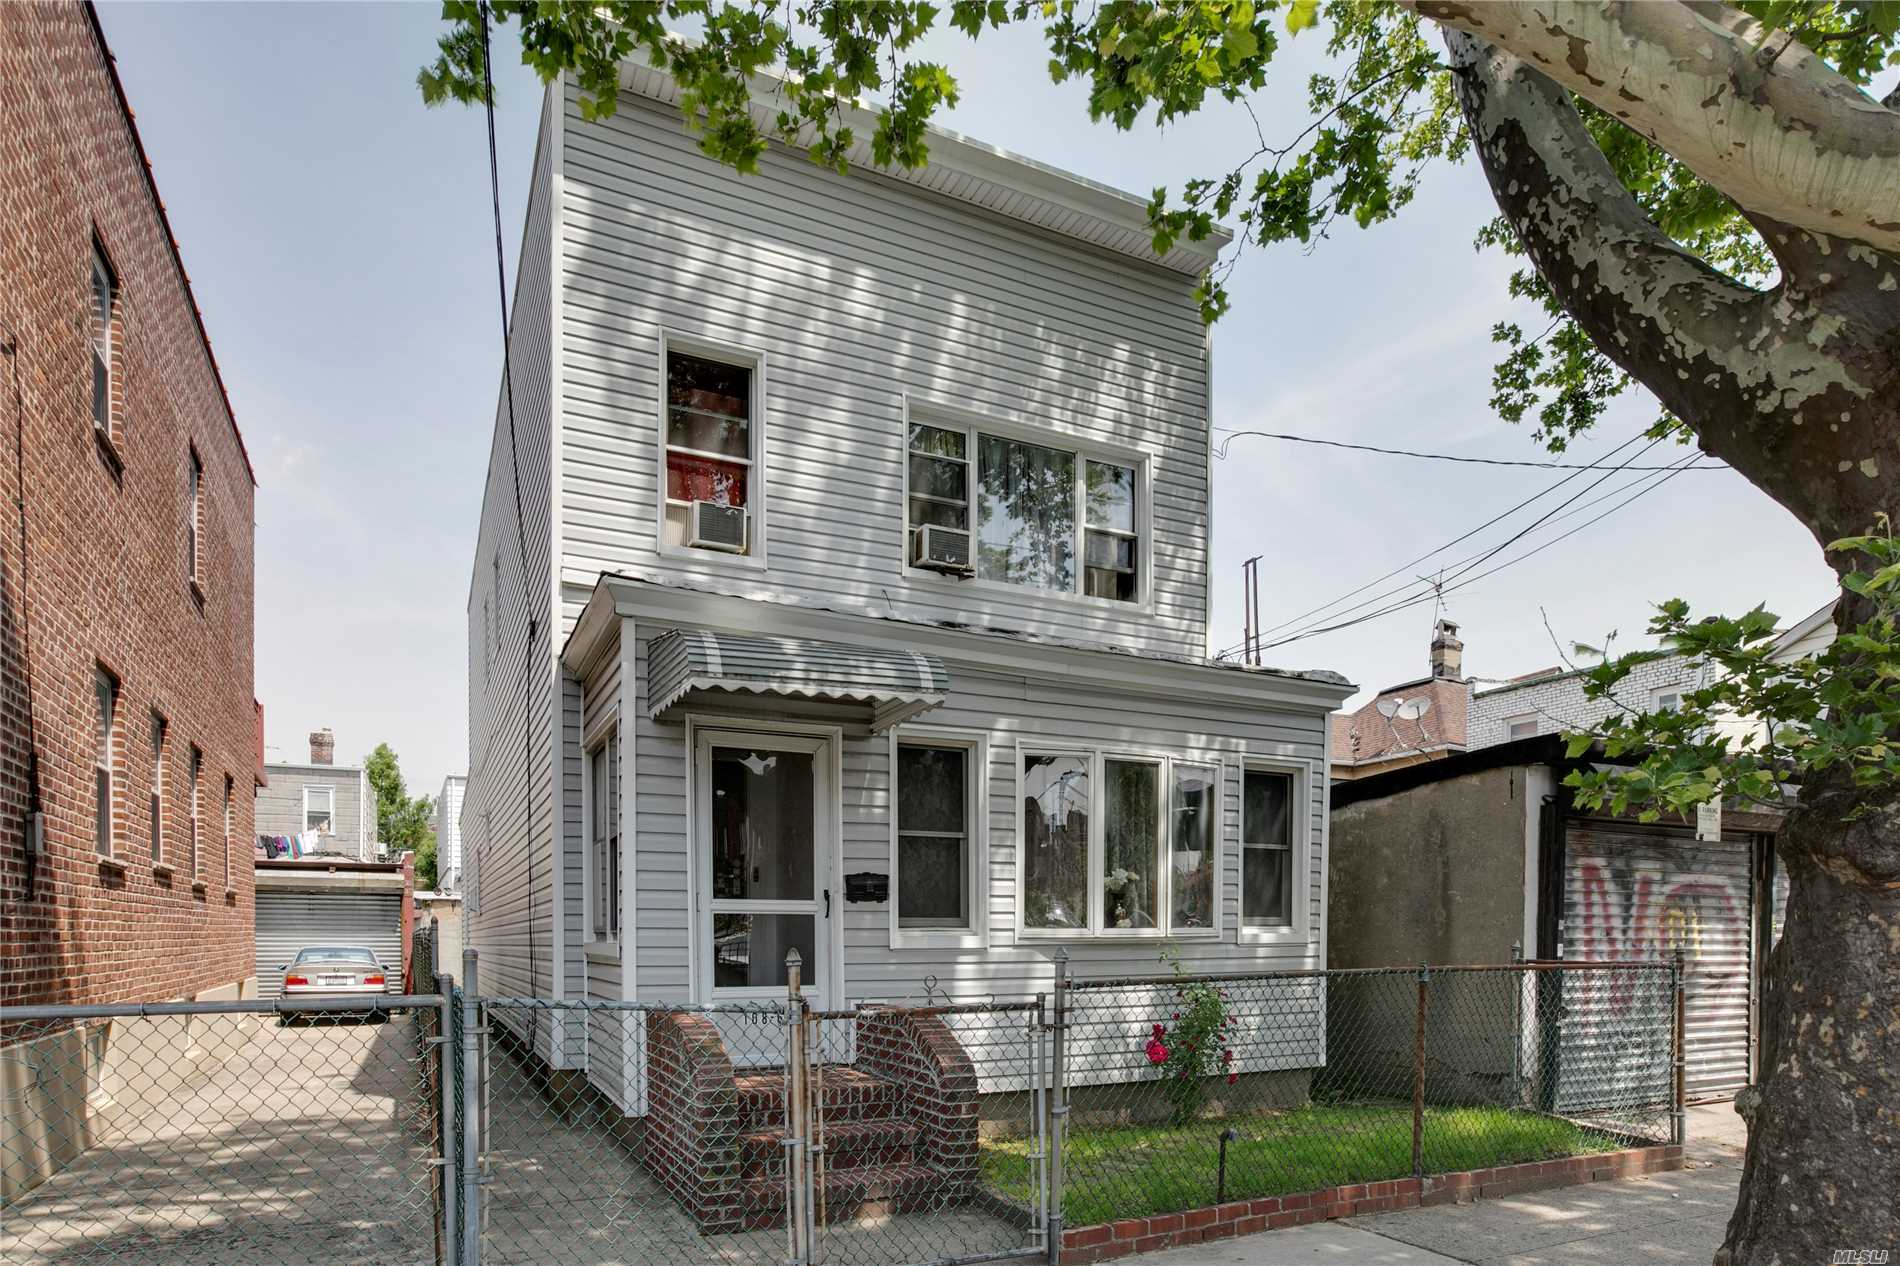 108-69 43rd Ave - Corona, New York